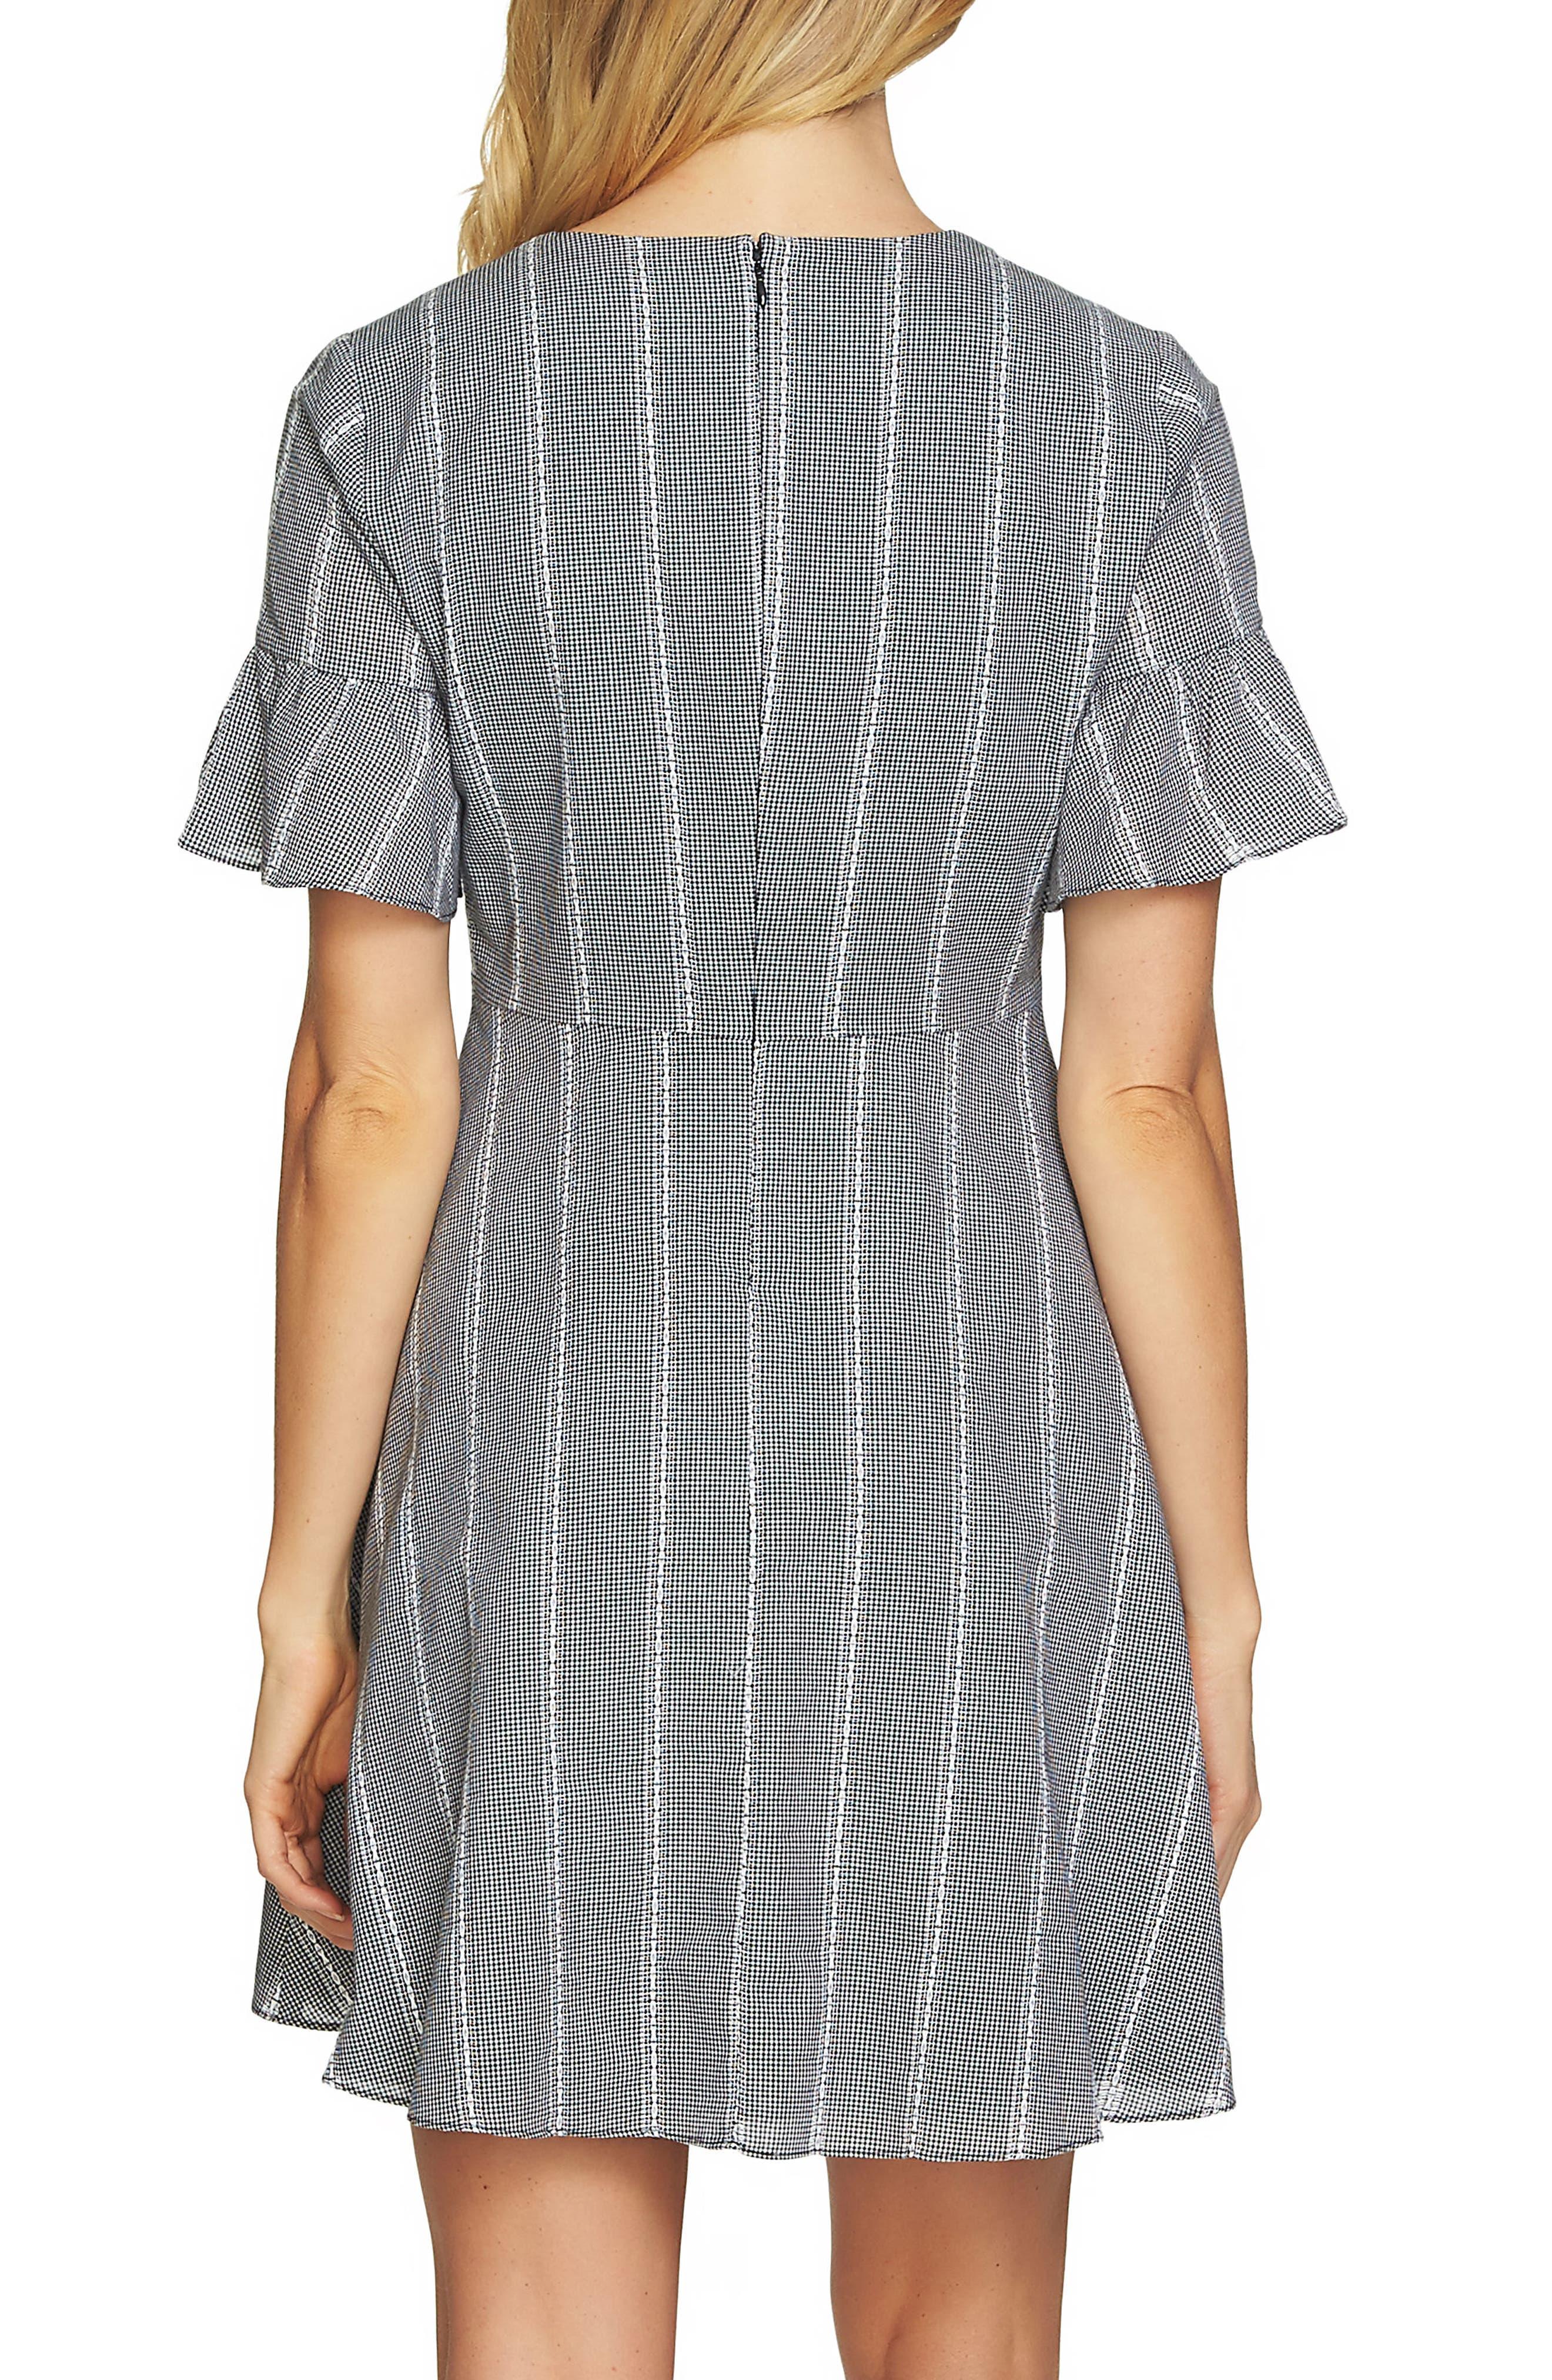 Ruffle Sleeve Pintuck Dress,                             Alternate thumbnail 2, color,                             006